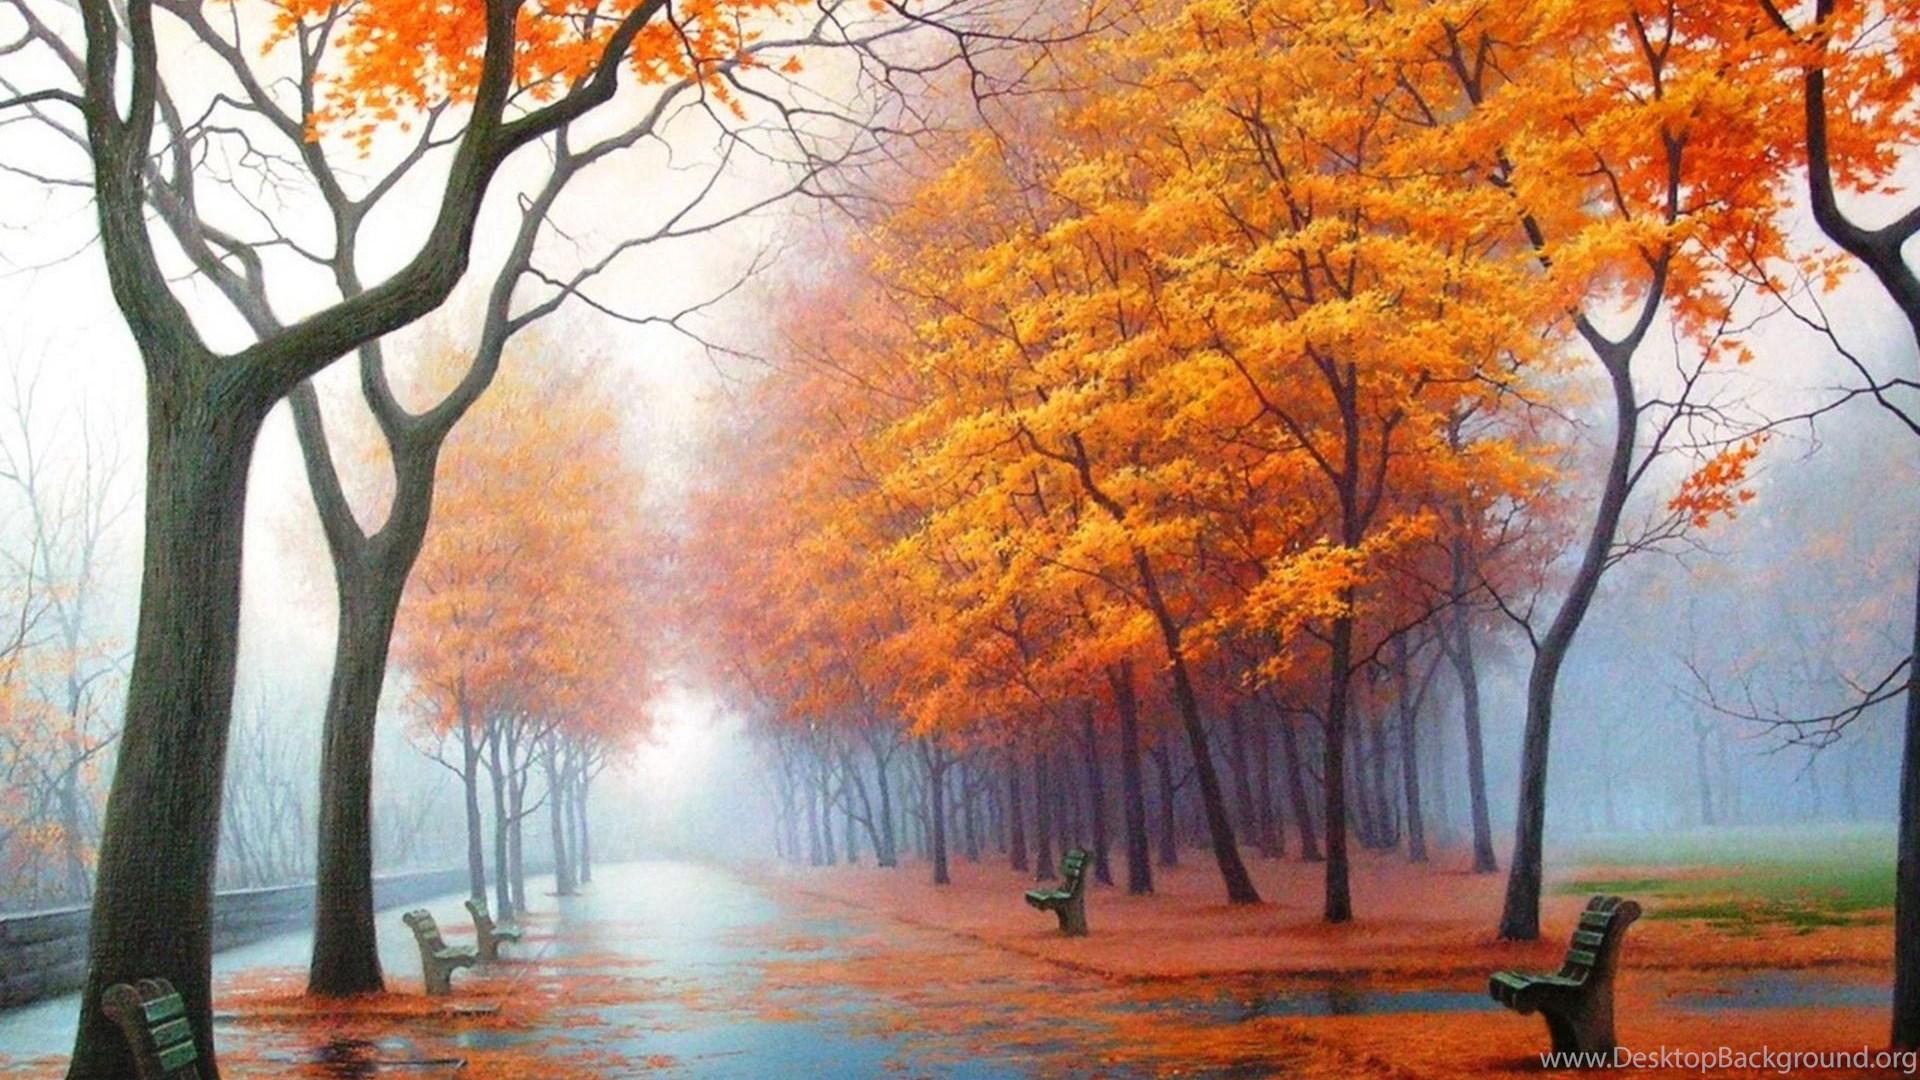 Ultra Hd 4k Autumn Wallpapers Hd Desktop Backgrounds 3840x2400 Desktop Background